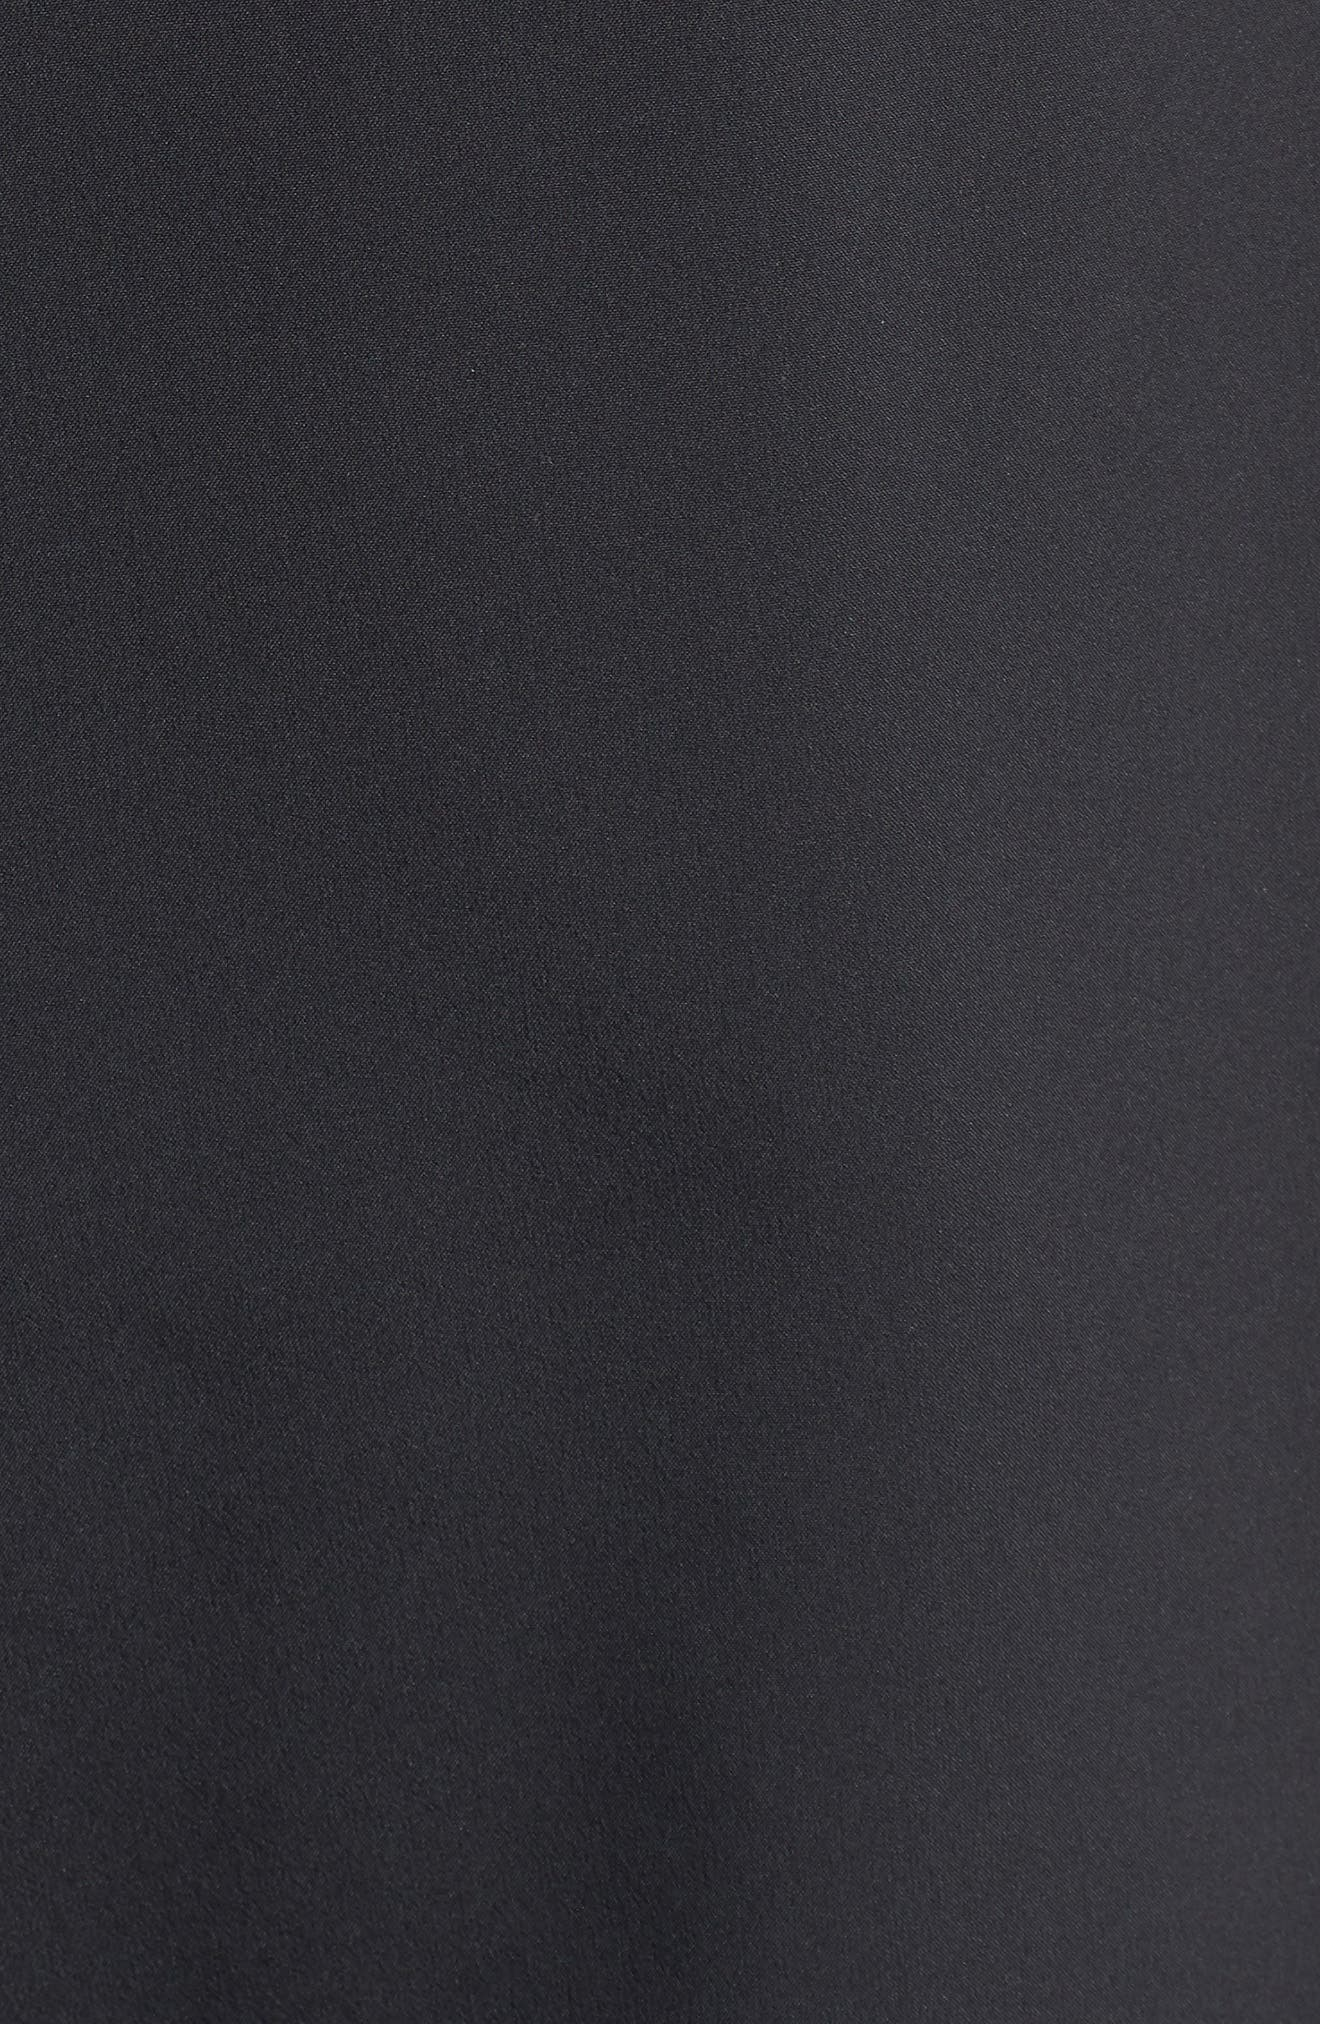 Flex Distance Running Shorts,                             Alternate thumbnail 5, color,                             Black/ Black